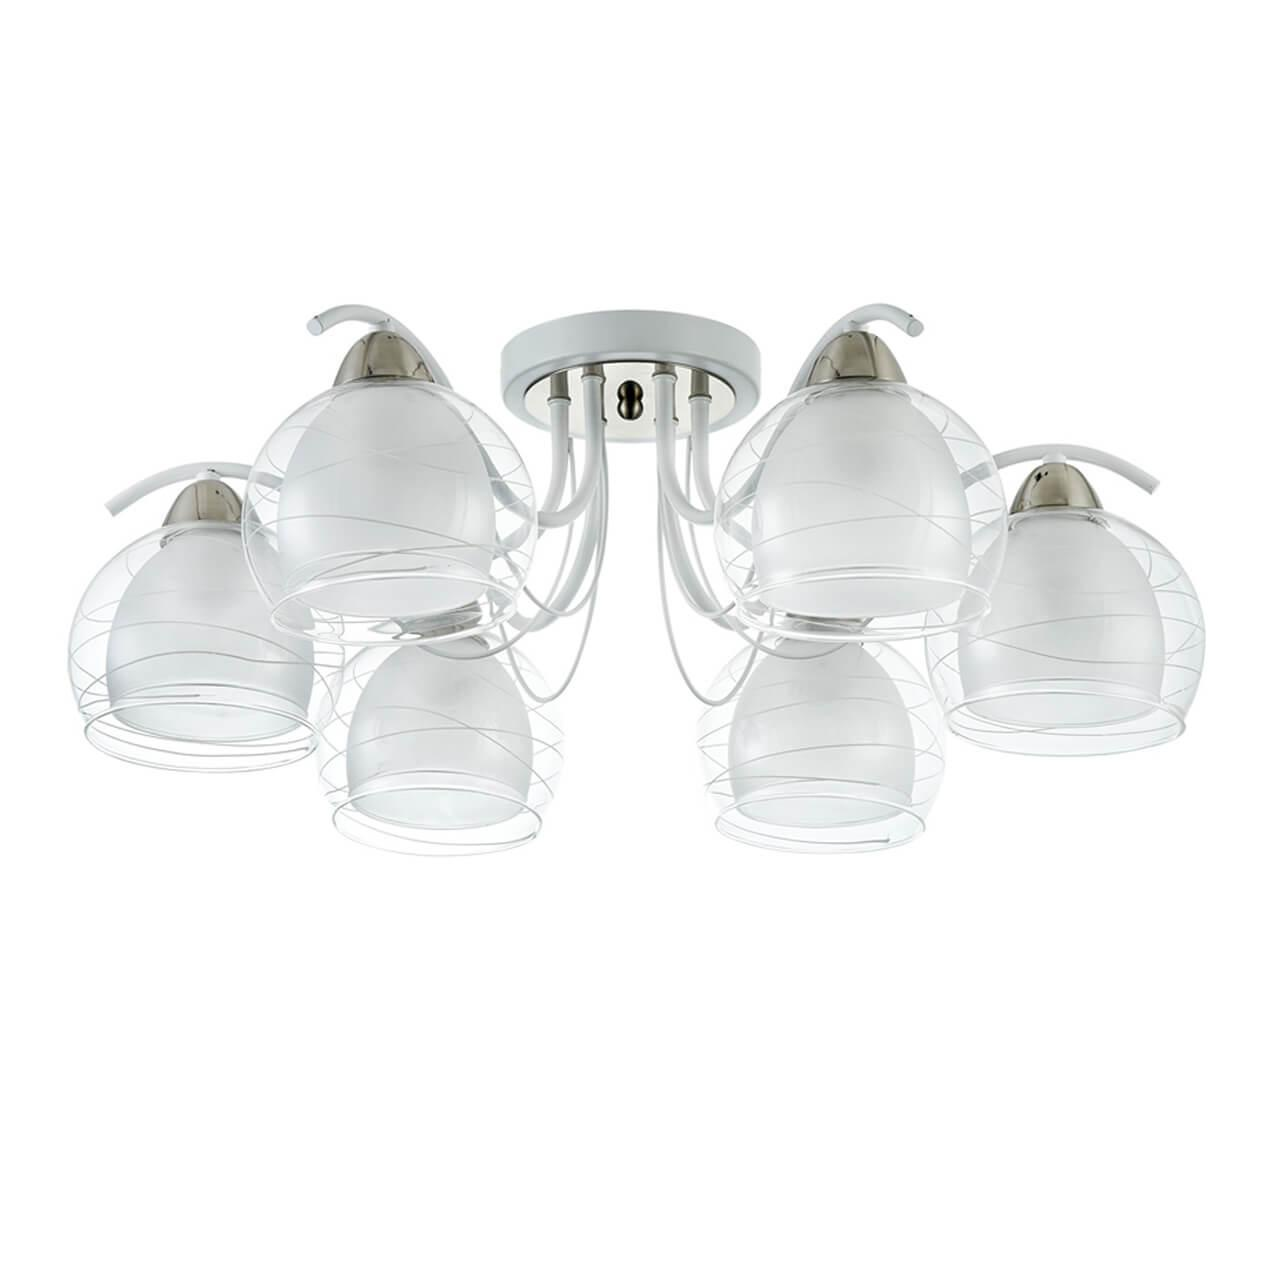 Потолочный светильник Freya FR5052-CL-06-W, E27, 60 Вт люстра freya freya fr5052 cl 08 w